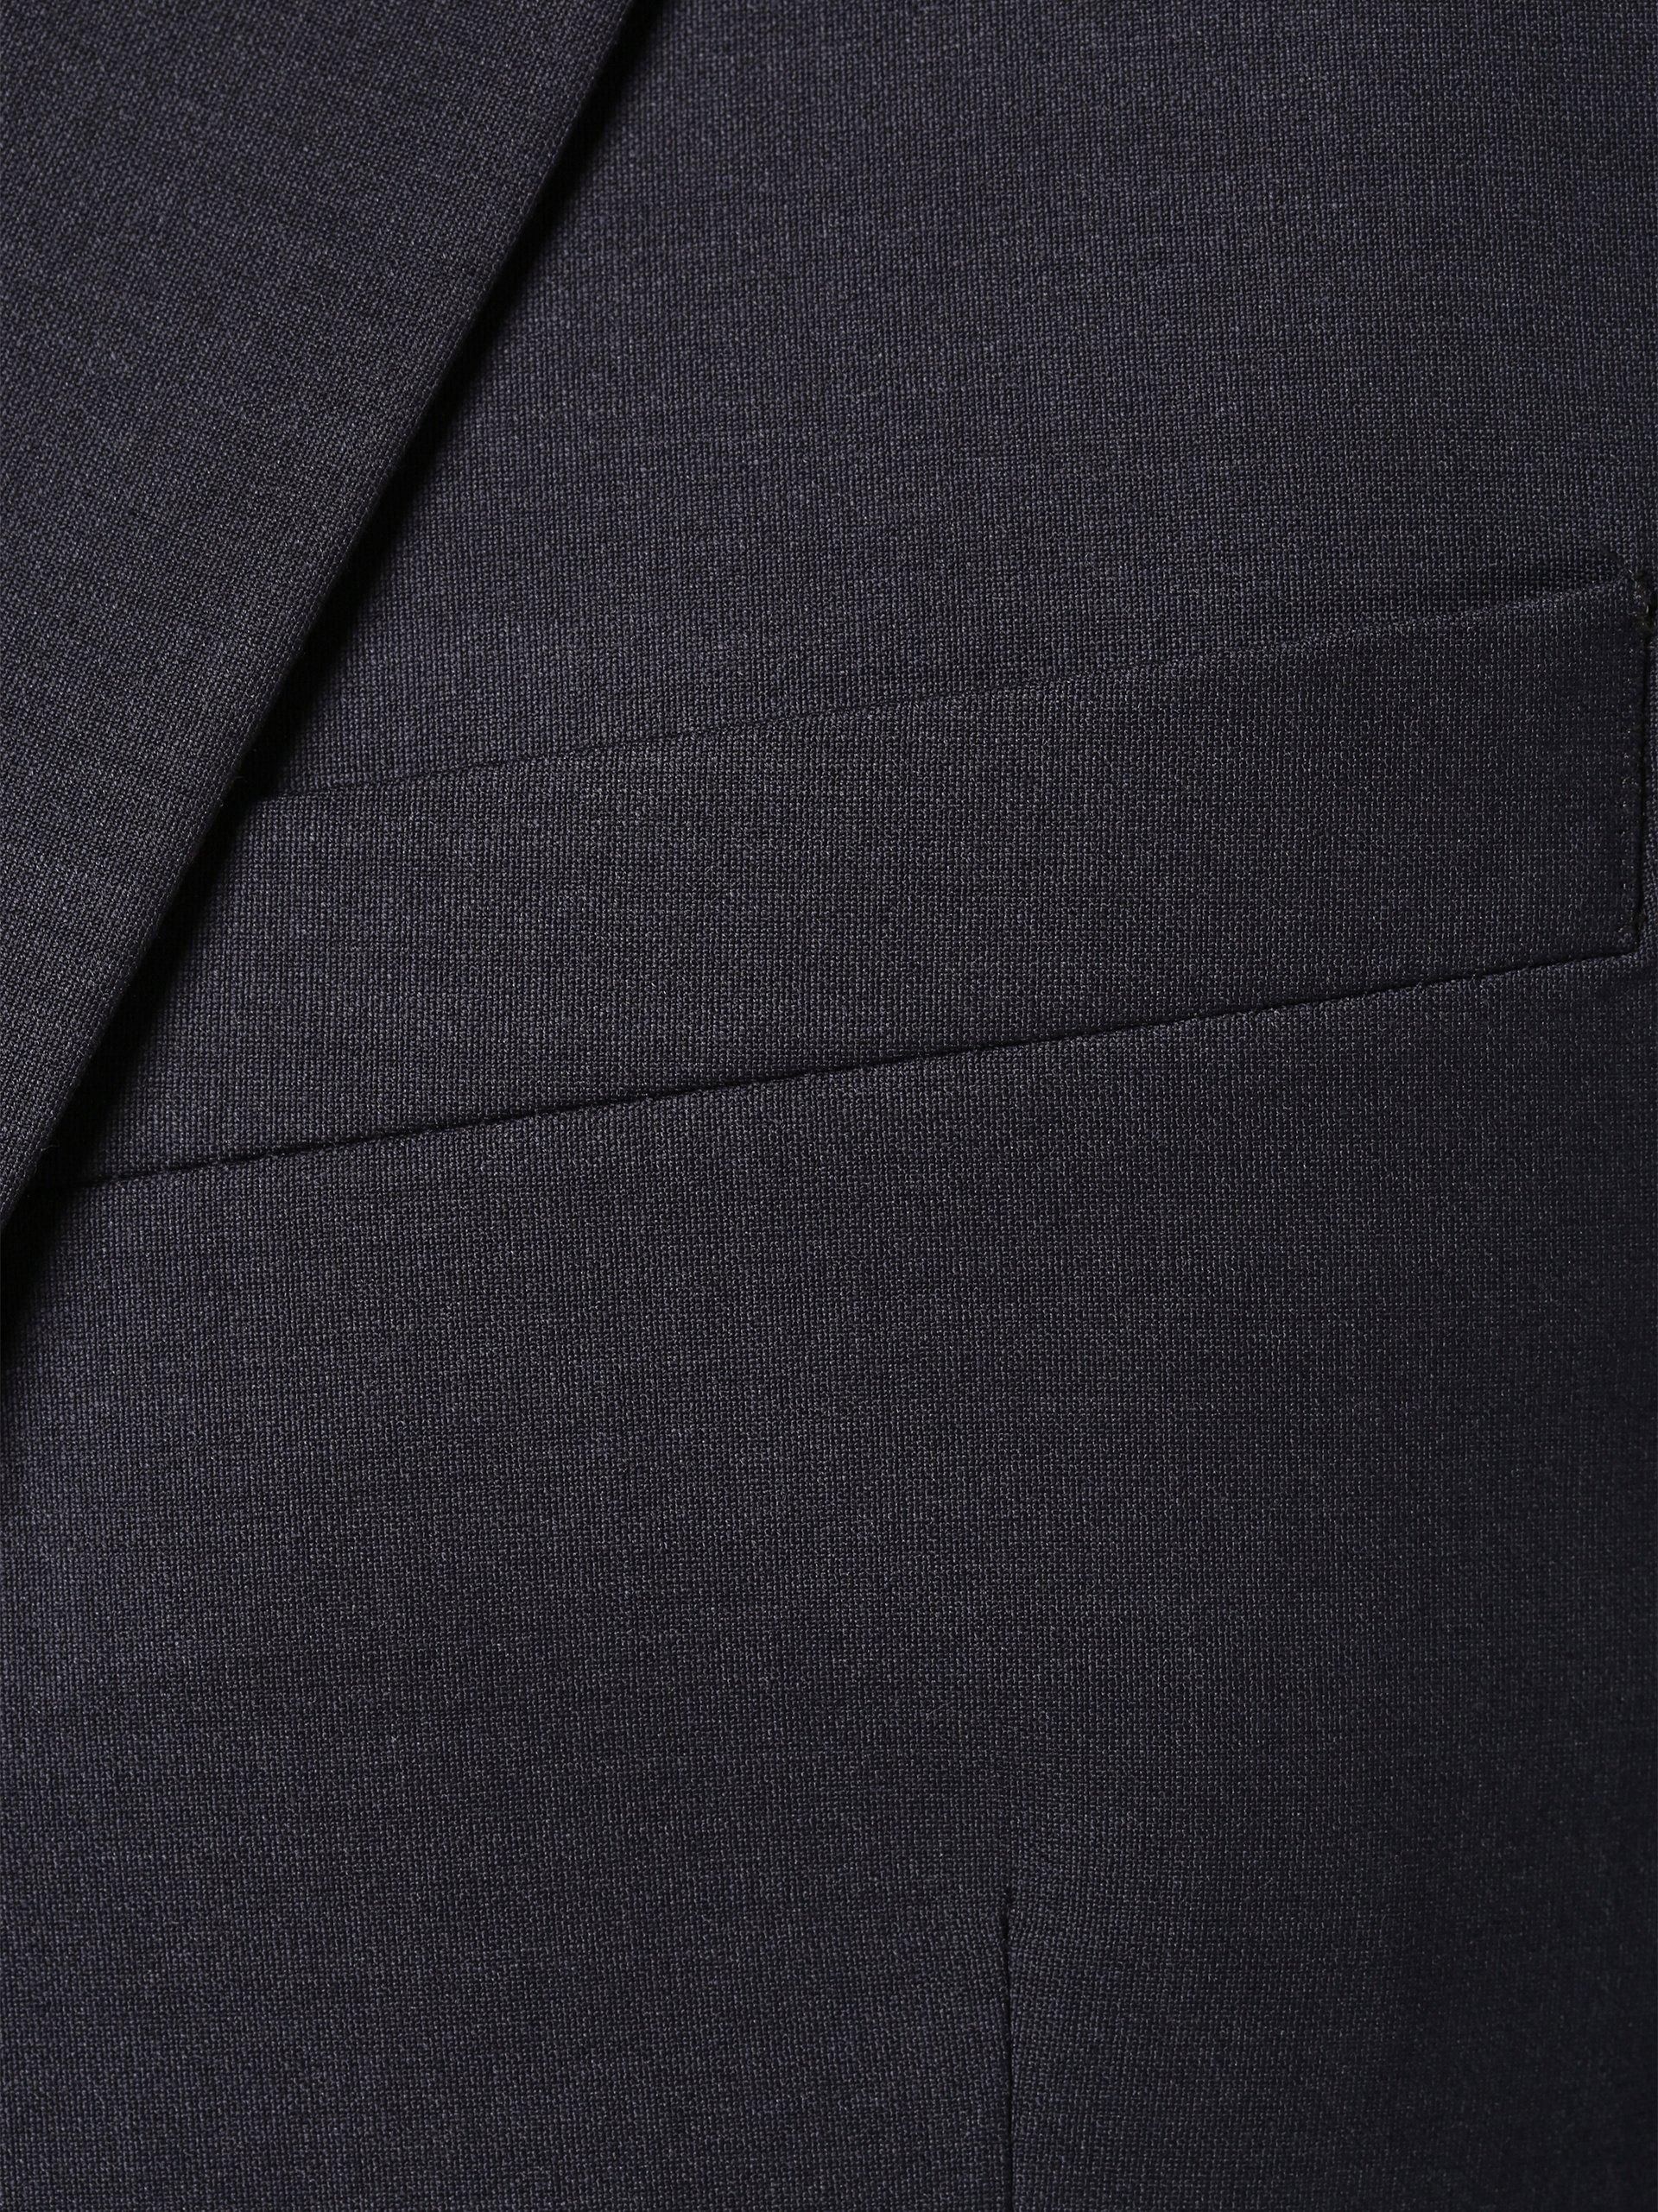 Finshley & Harding Męska marynarka od garnituru modułowego – Black Label